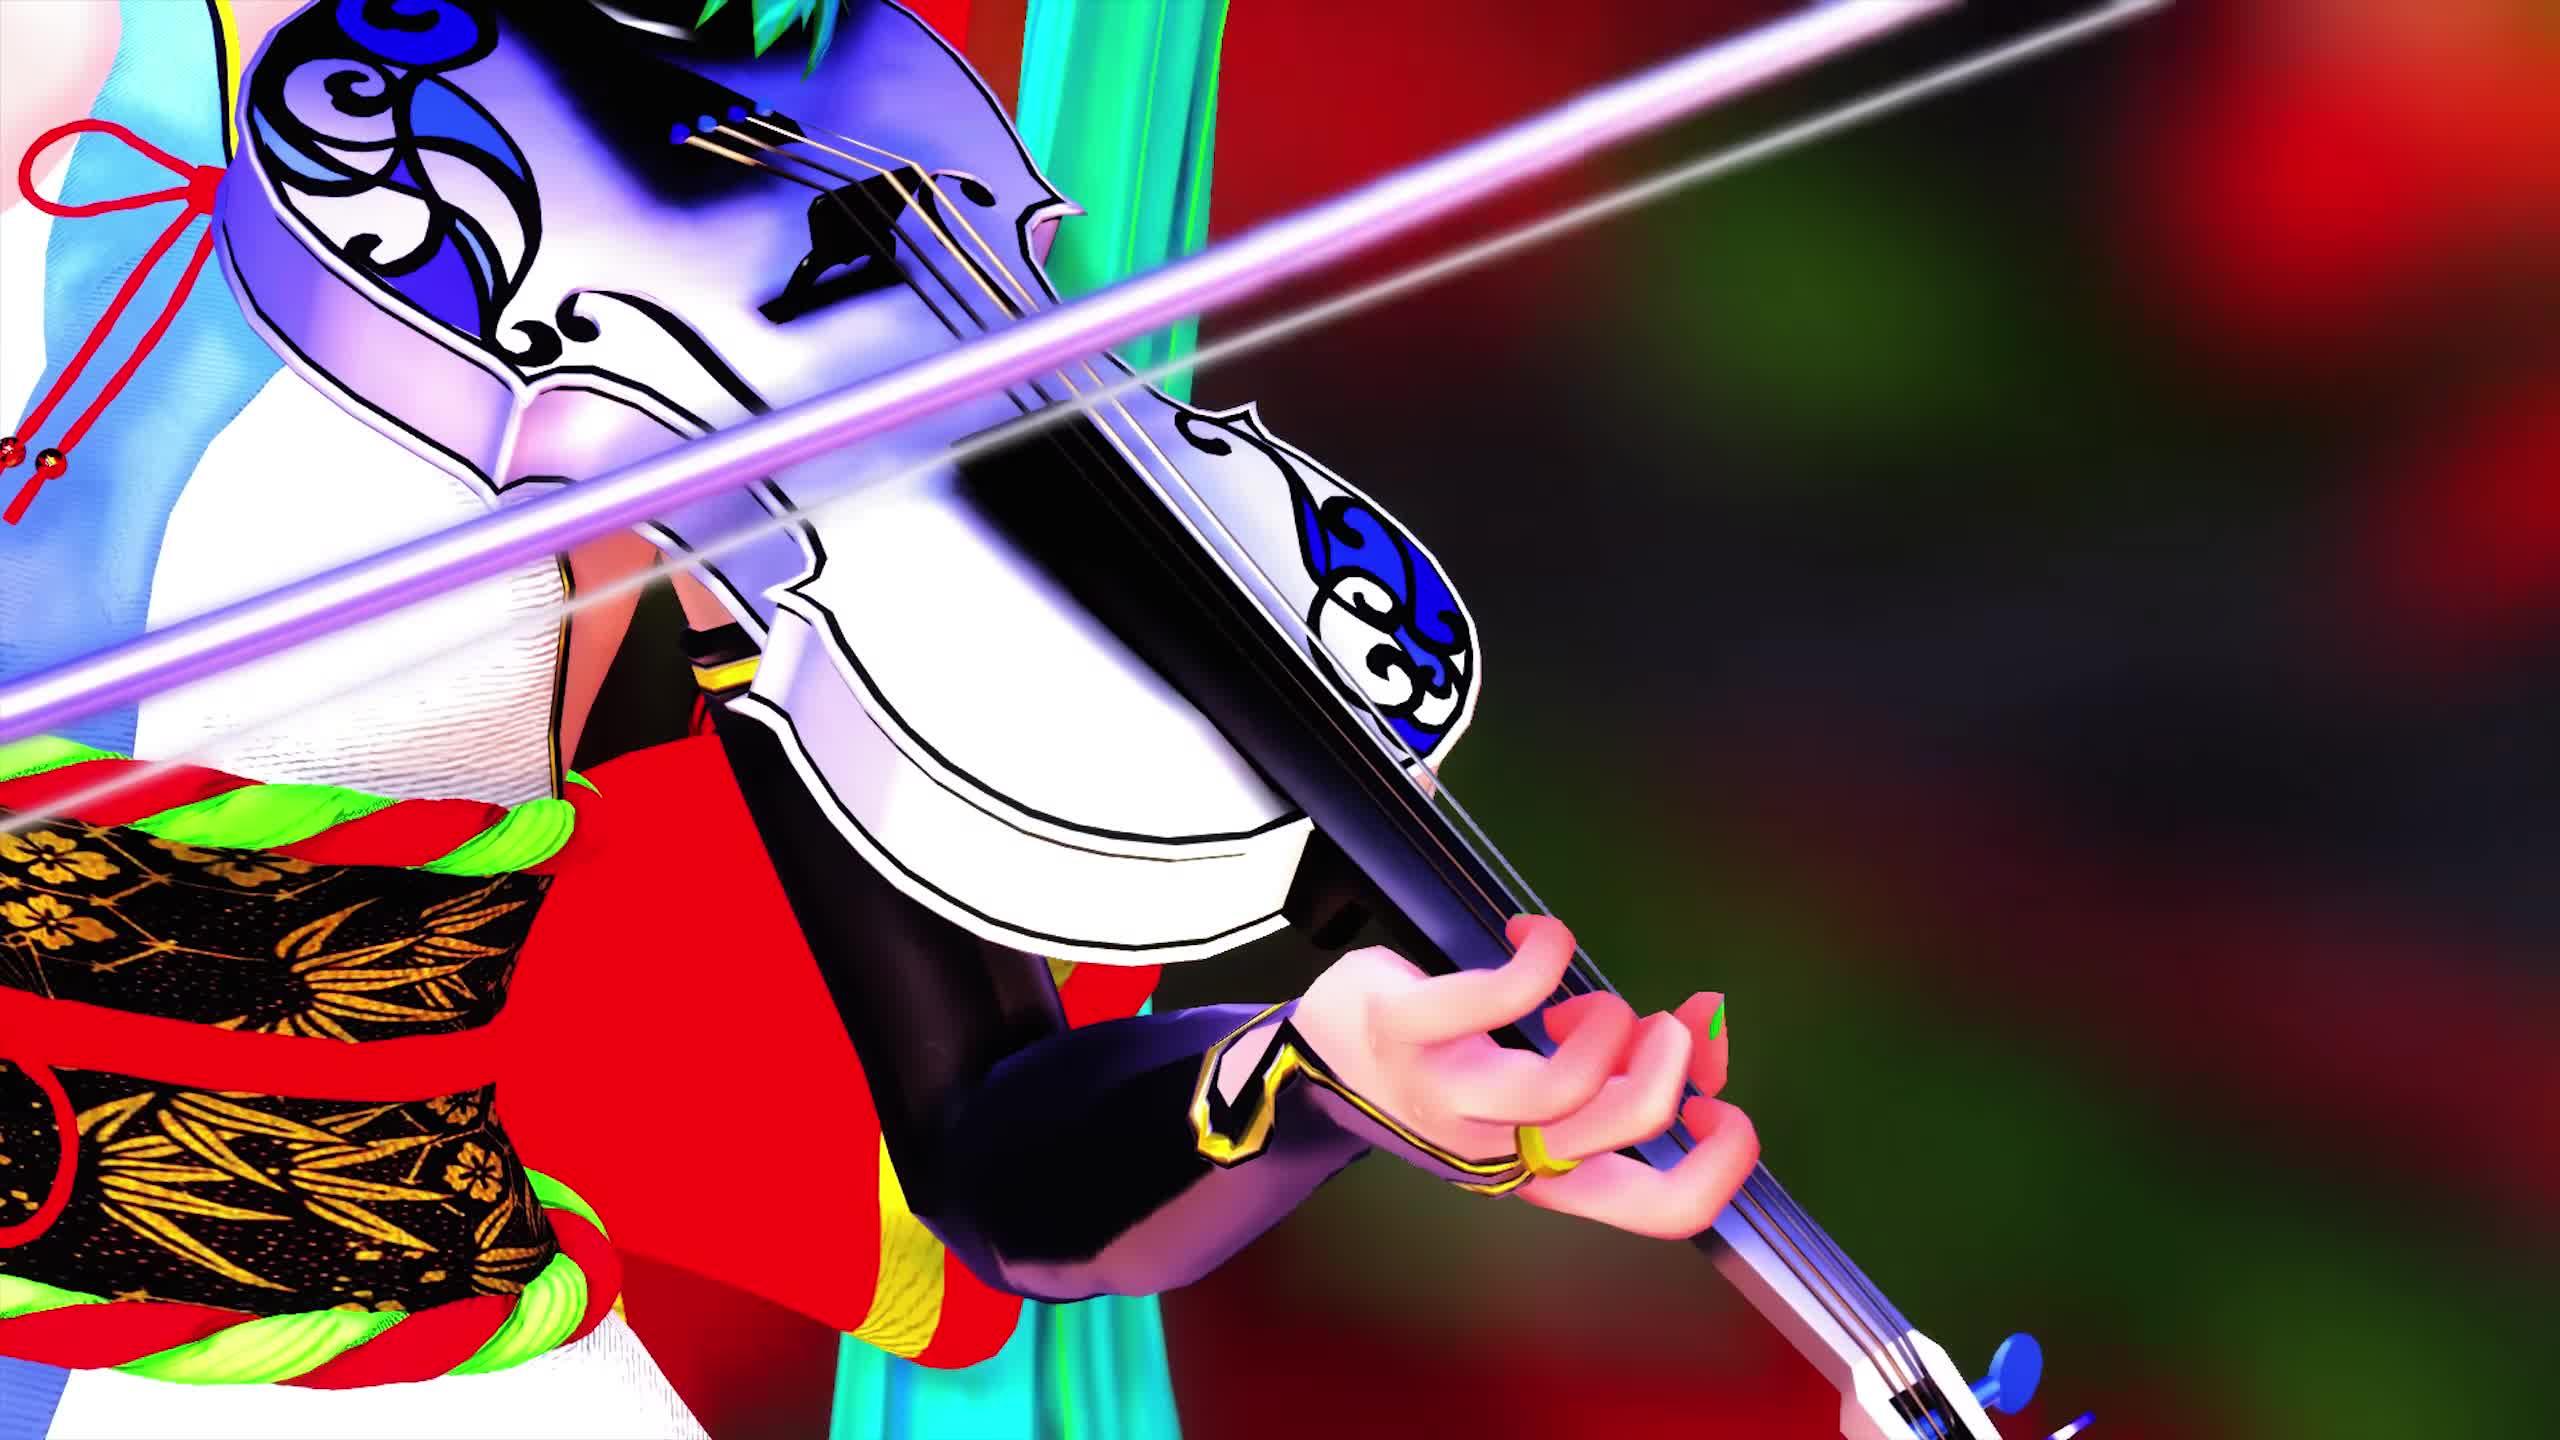 【MMD】 Senbonzakura 千本桜 Violin Cover Violin Lindsey Stirling